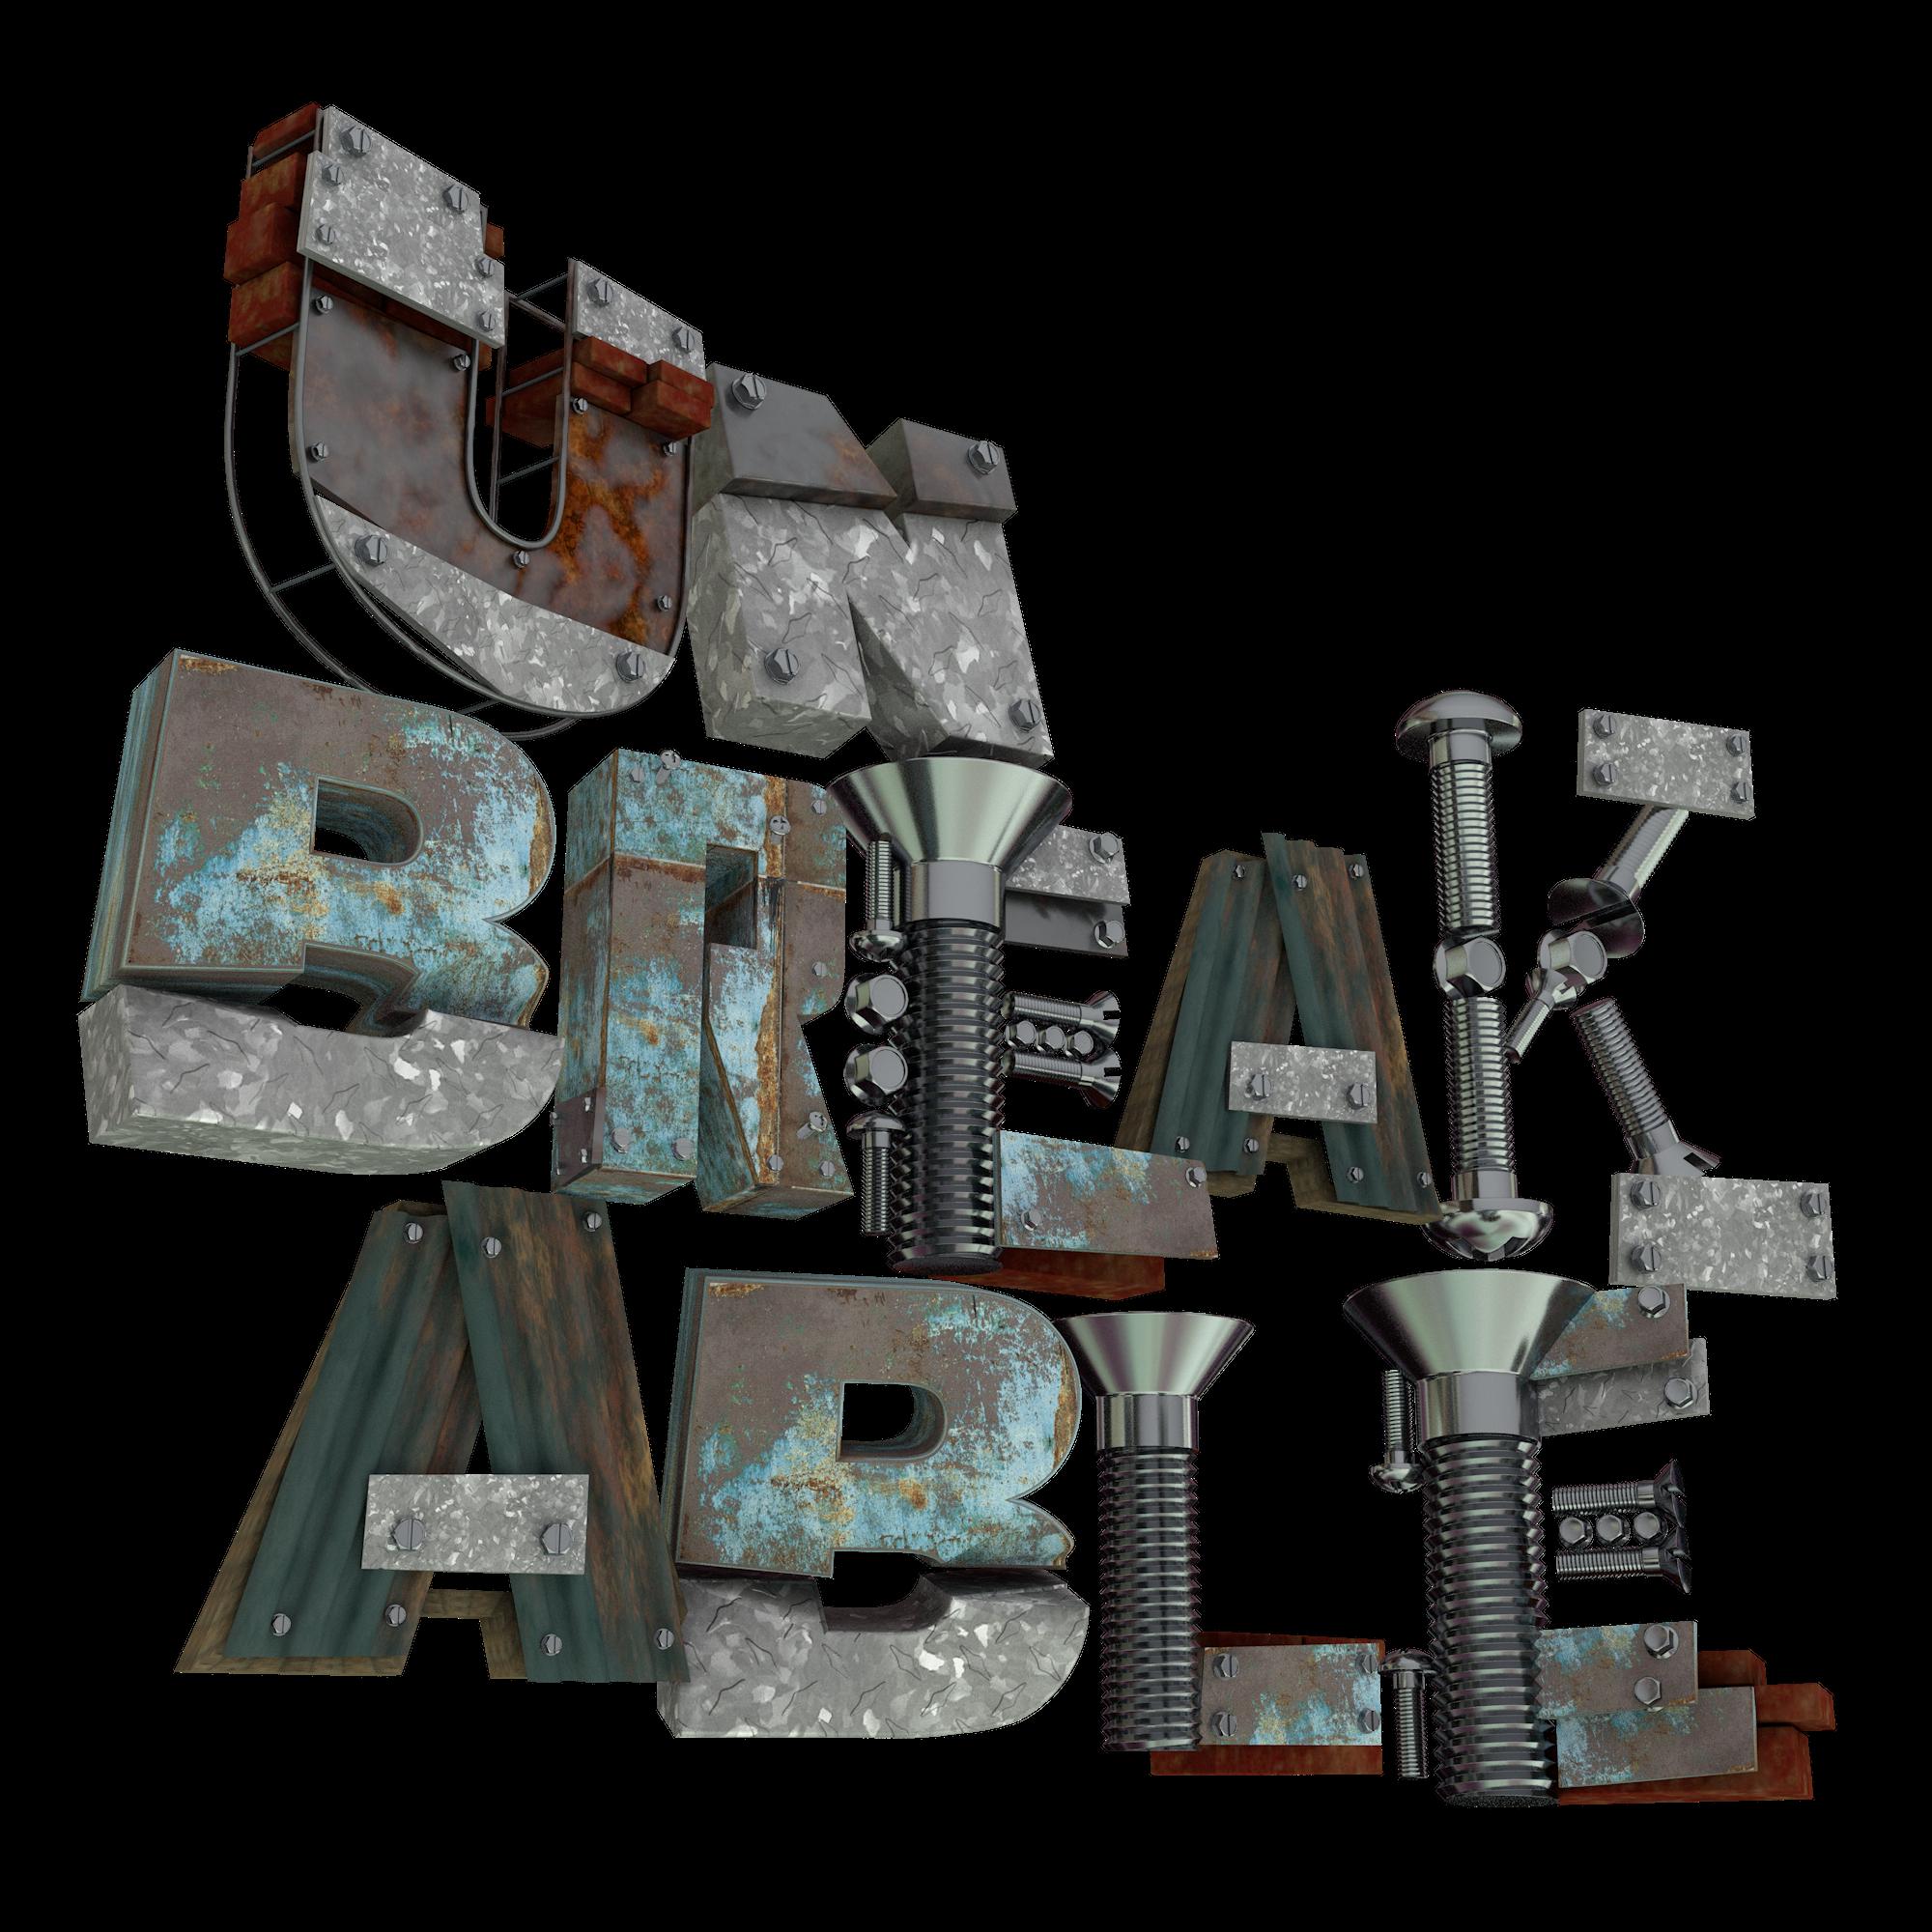 ALBOROSIE - Unbreakable type resolution